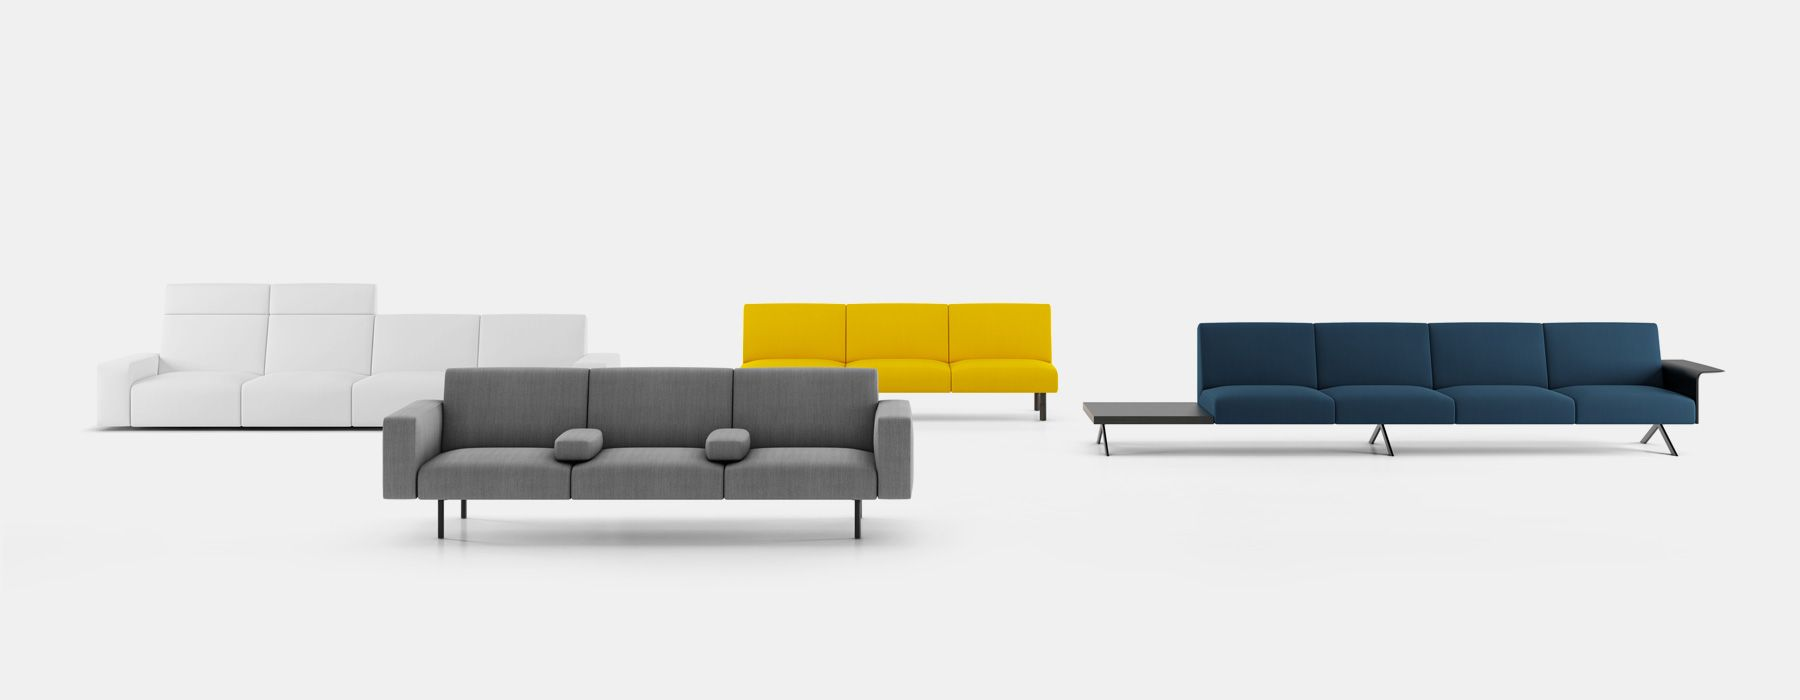 Viccarbe Lievore Altherr Molina Sistem Designboom 1800 A (1800×700) |  Furniture U0026 Product | Pinterest | Modular Sofa